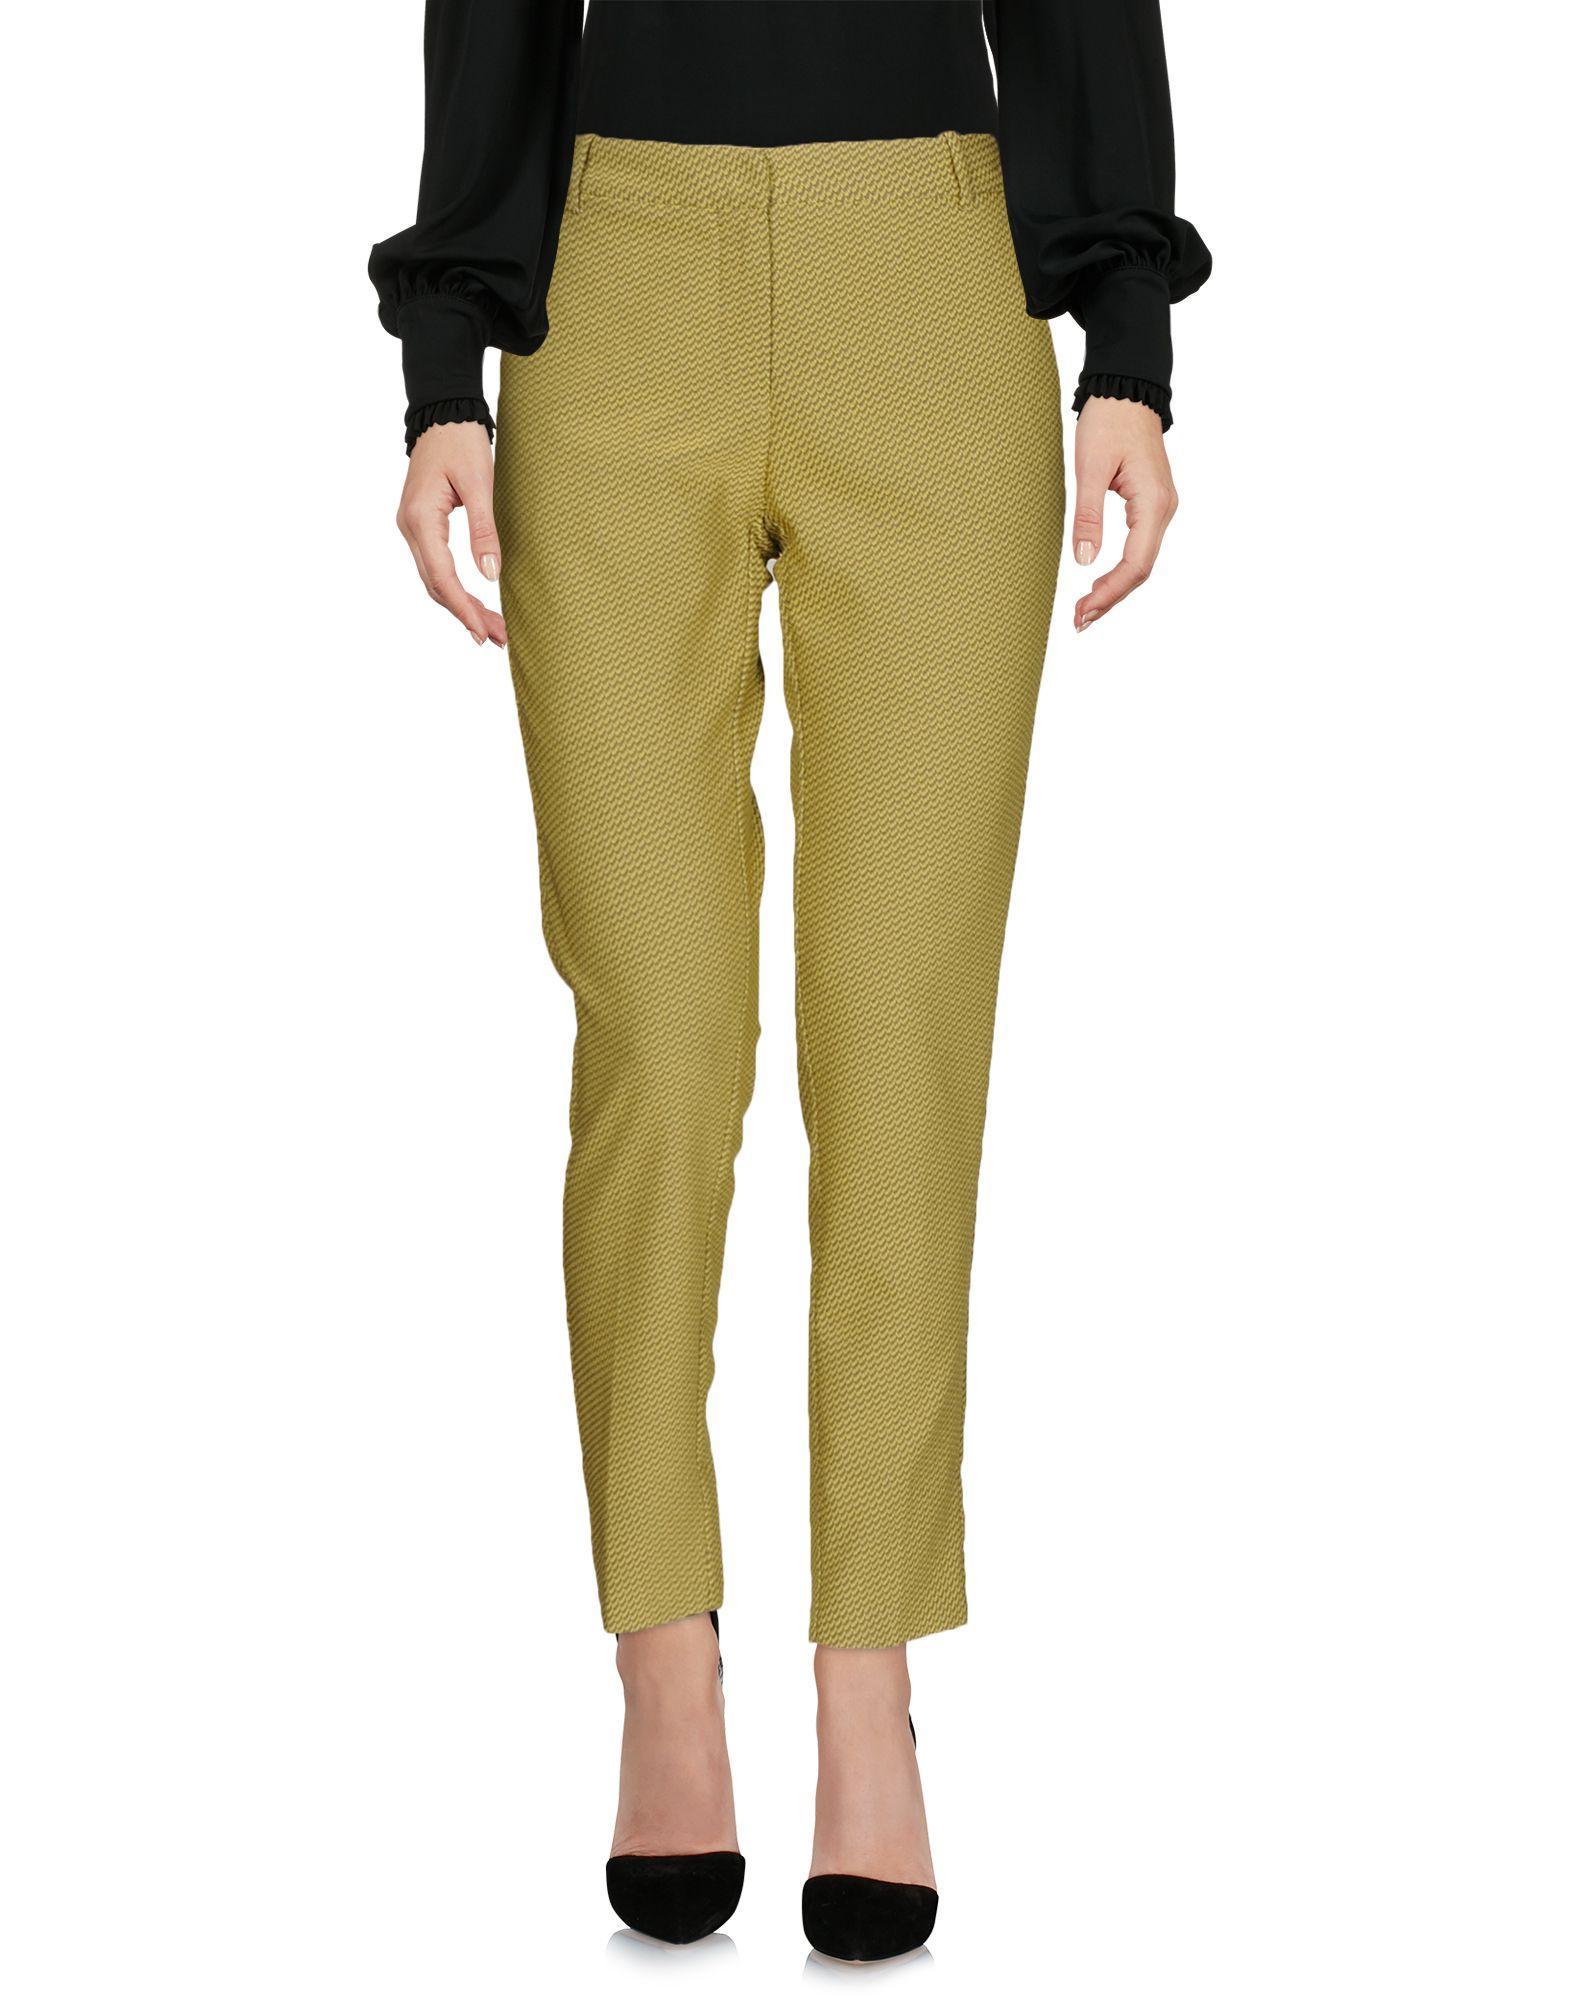 Teresa Dainelli Casual Pants In Acid Green